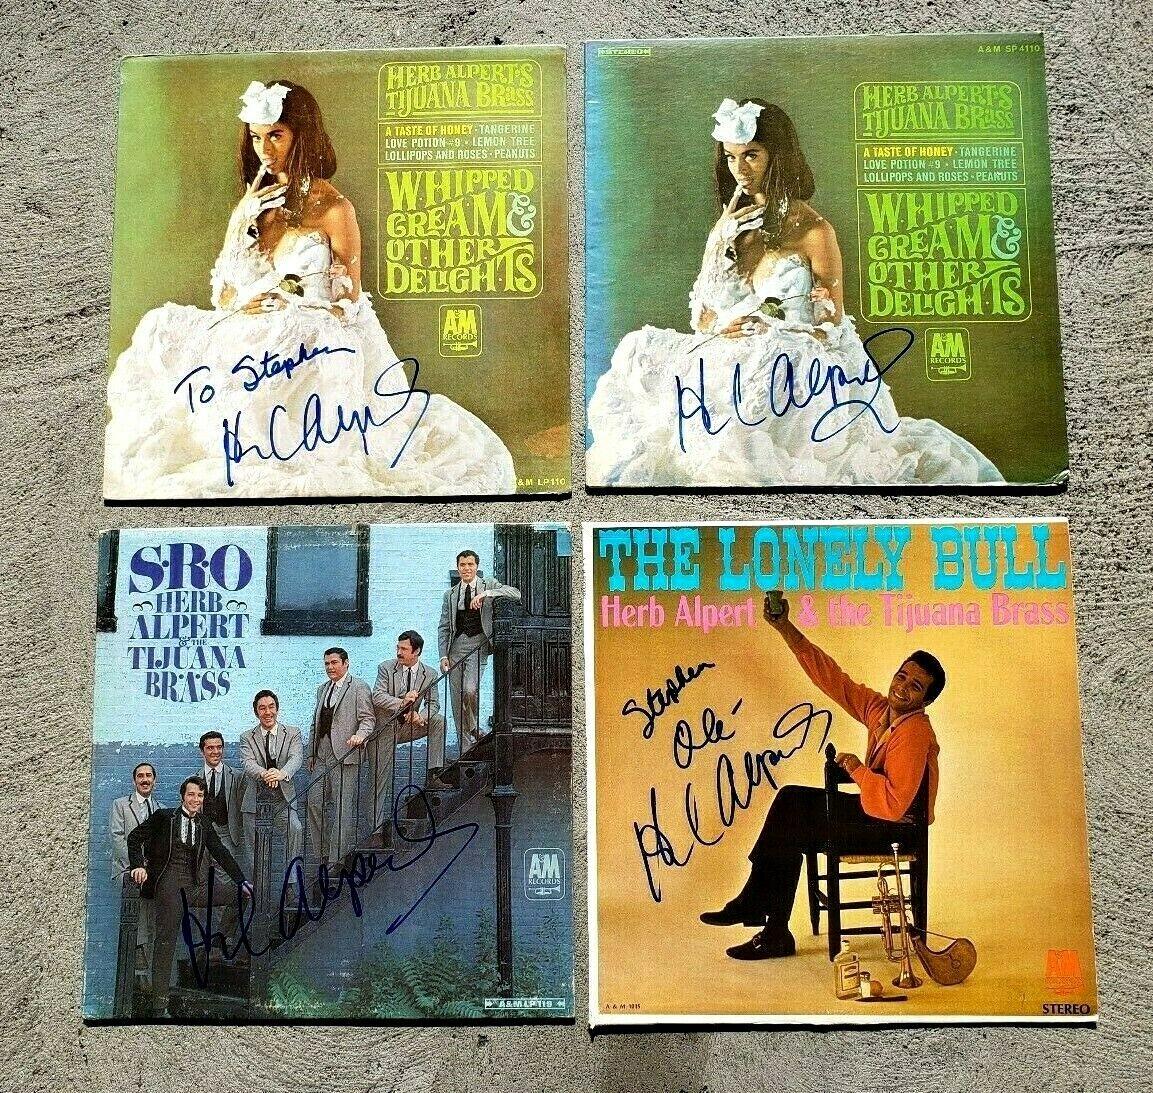 Herb Alpert & The Tijuana Brass LP - Sounds Like